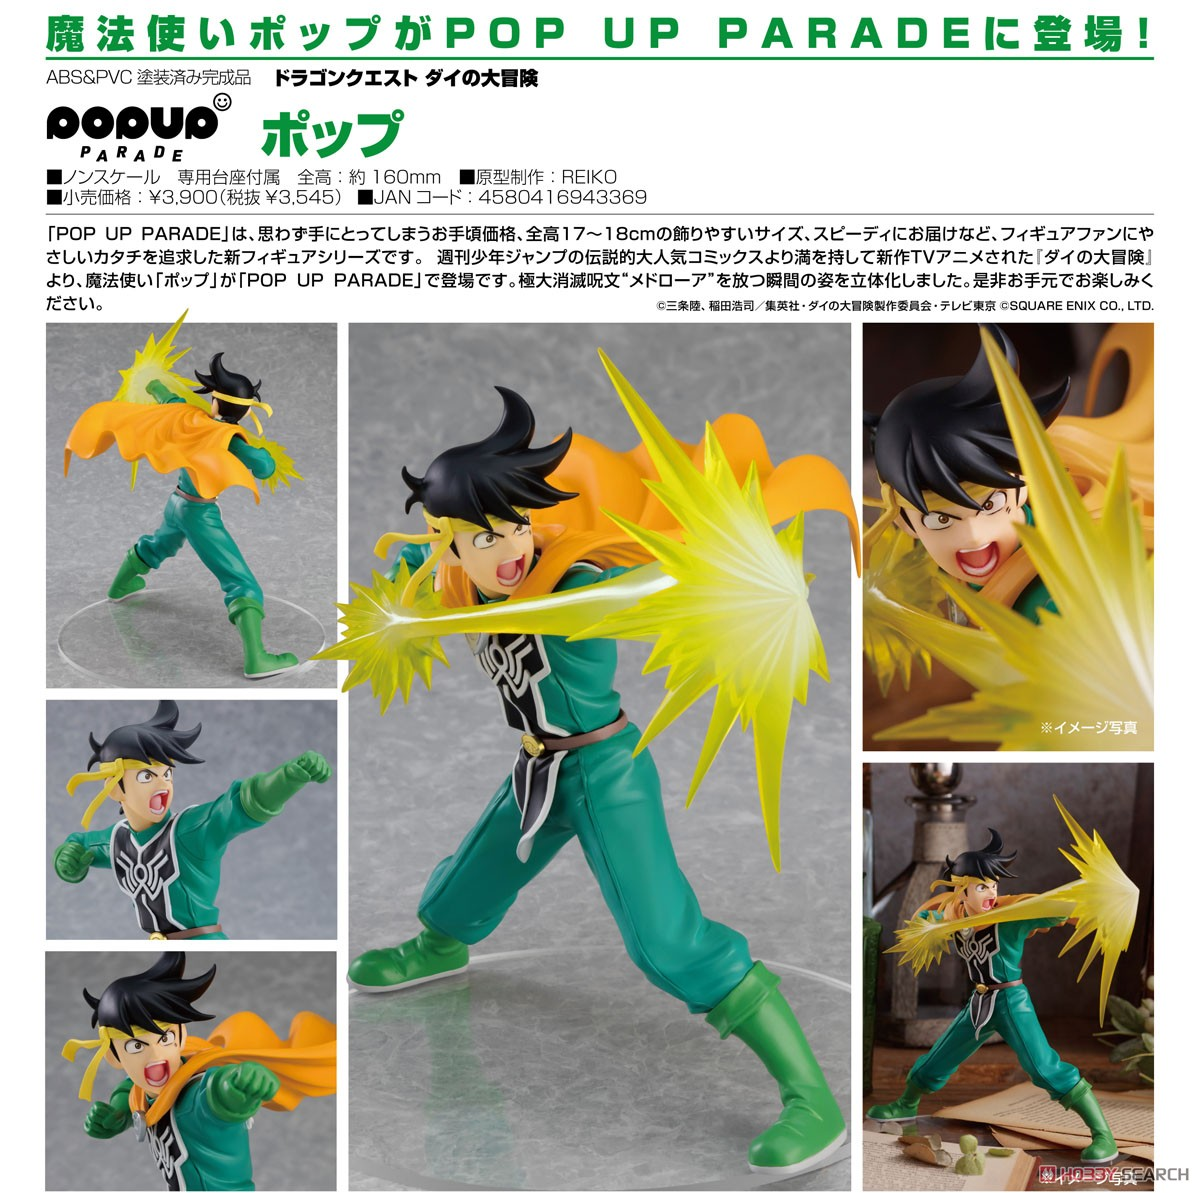 POP UP PARADE『ダイ』ドラゴンクエスト ダイの大冒険 完成品フィギュア-019